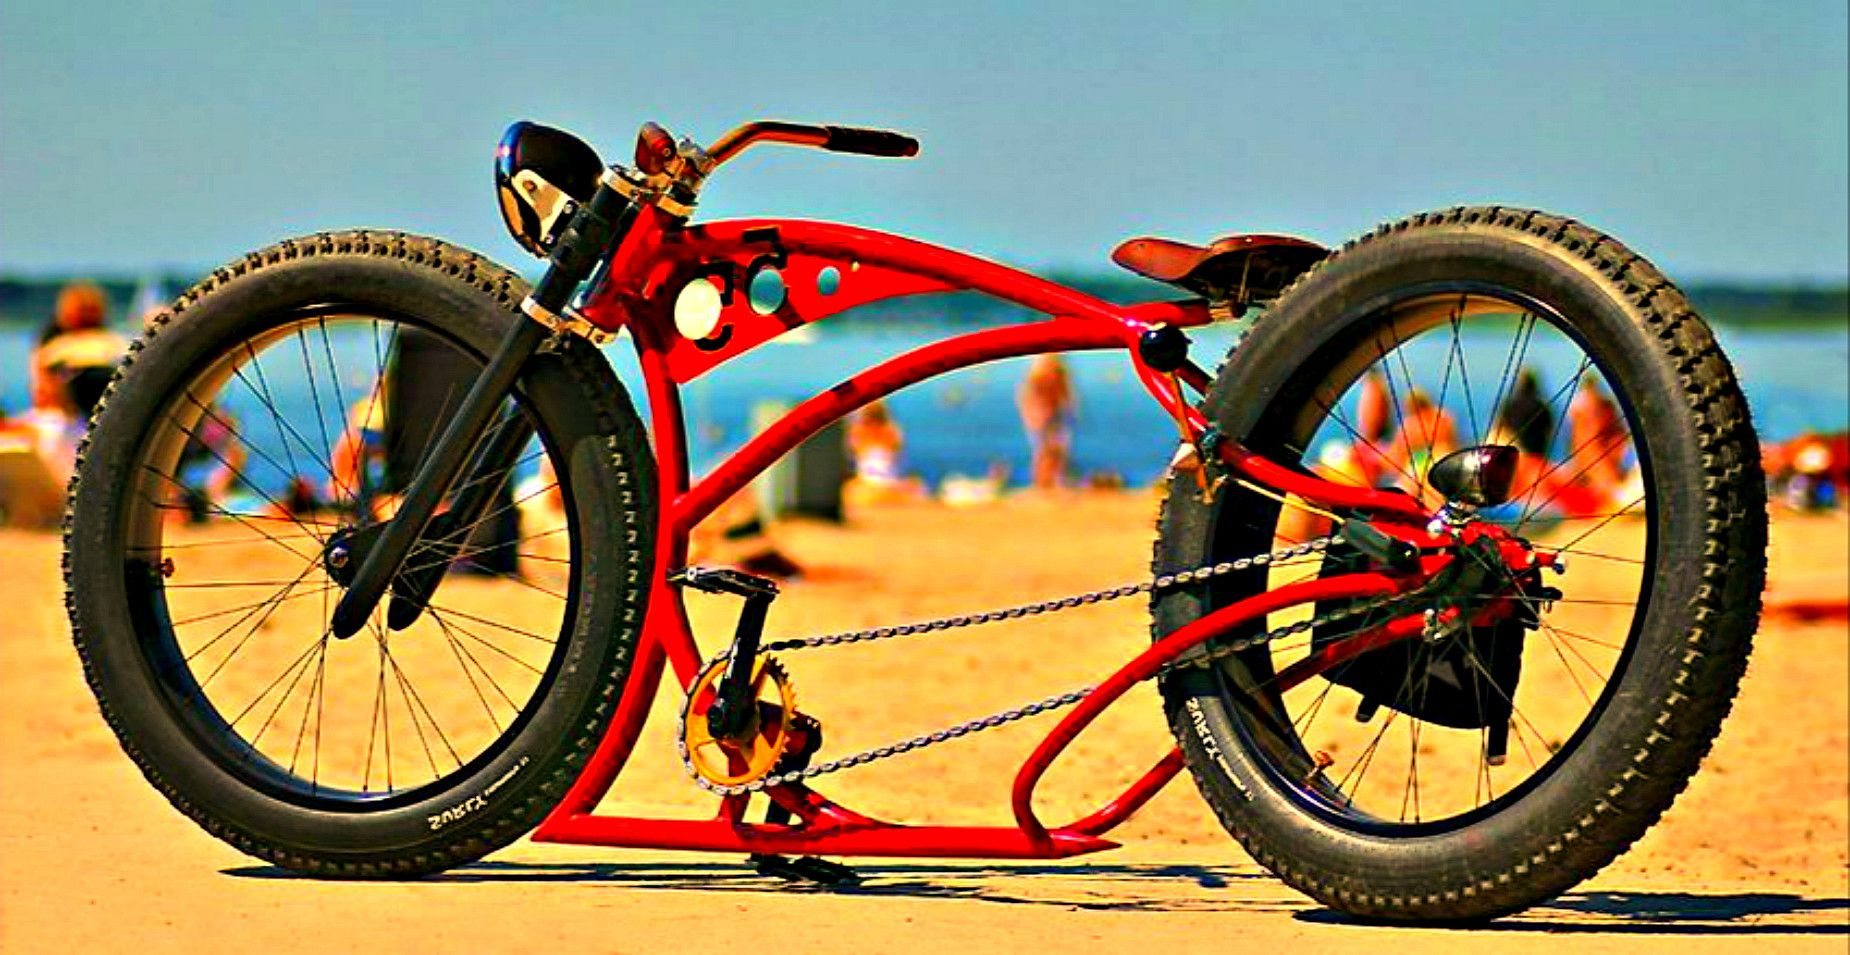 Велообзор (68 фото) Cruiser bicycle, Lowrider bike